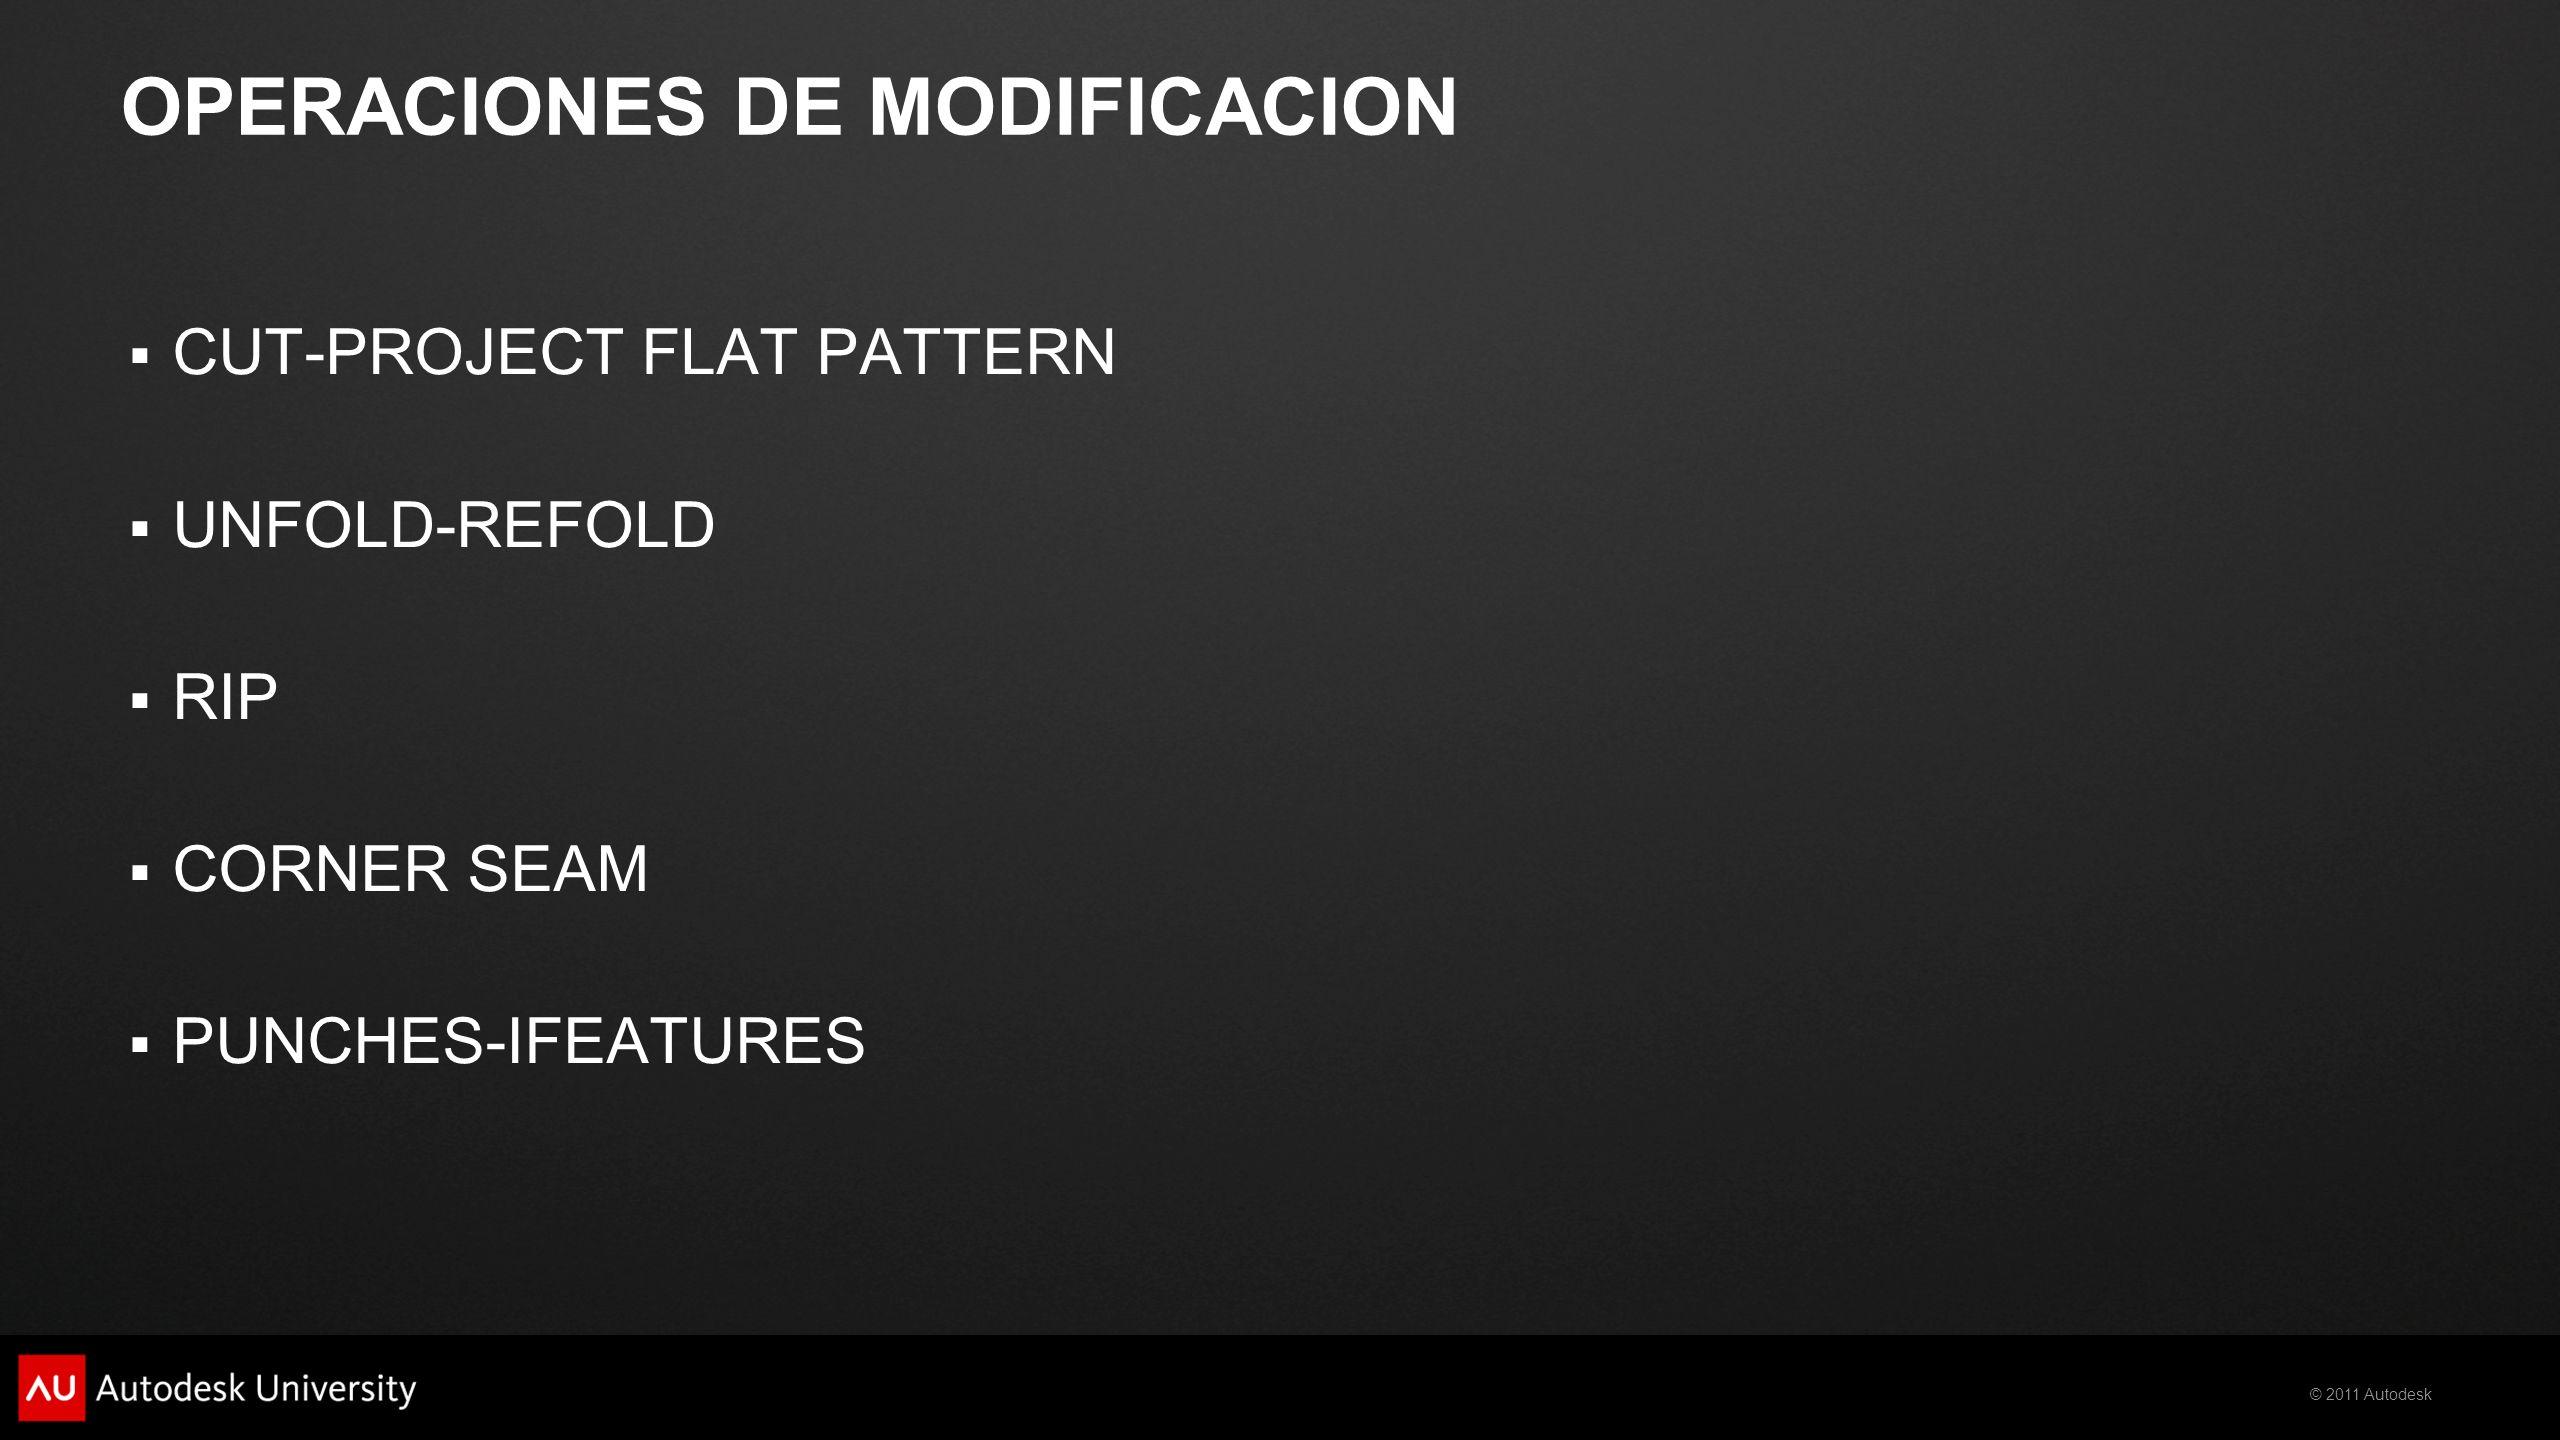 © 2011 Autodesk OPERACIONES DE MODIFICACION CUT-PROJECT FLAT PATTERN UNFOLD-REFOLD RIP CORNER SEAM PUNCHES-IFEATURES